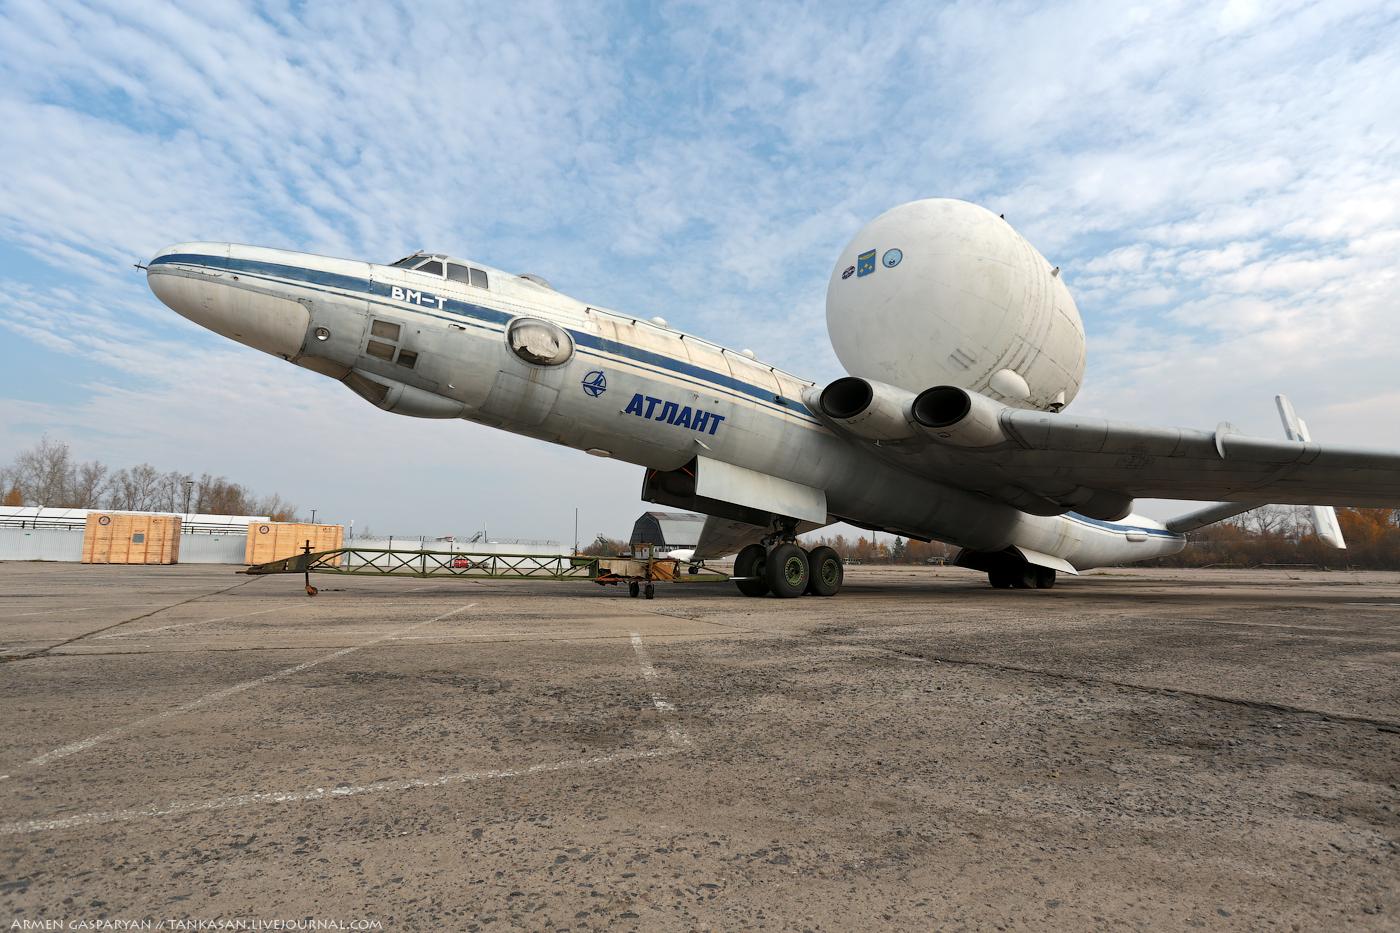 Обои Самолёт, советский, Вм-т, атлант. Авиация foto 10